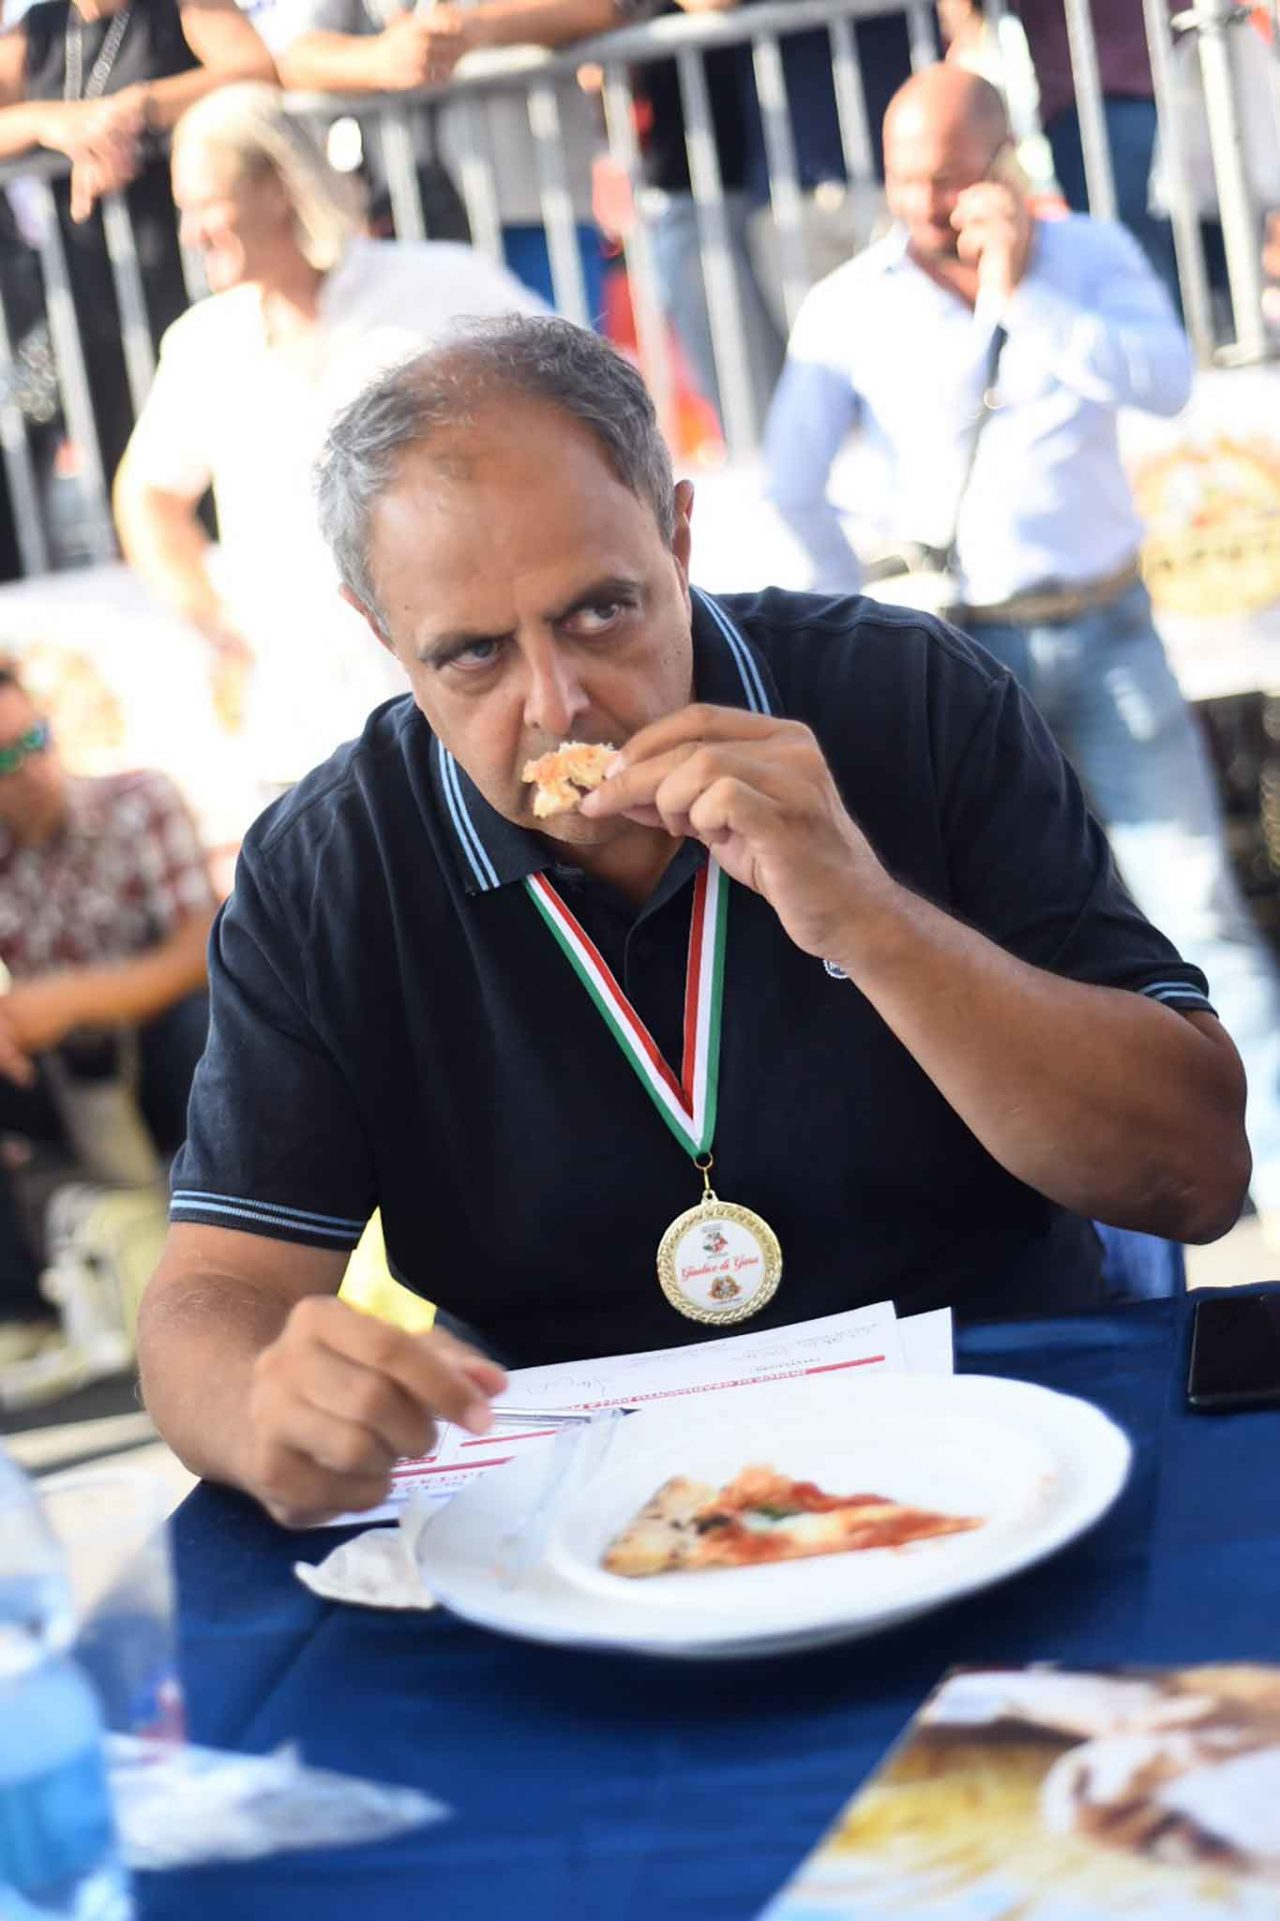 Vincenzo Pagano giudice pizze